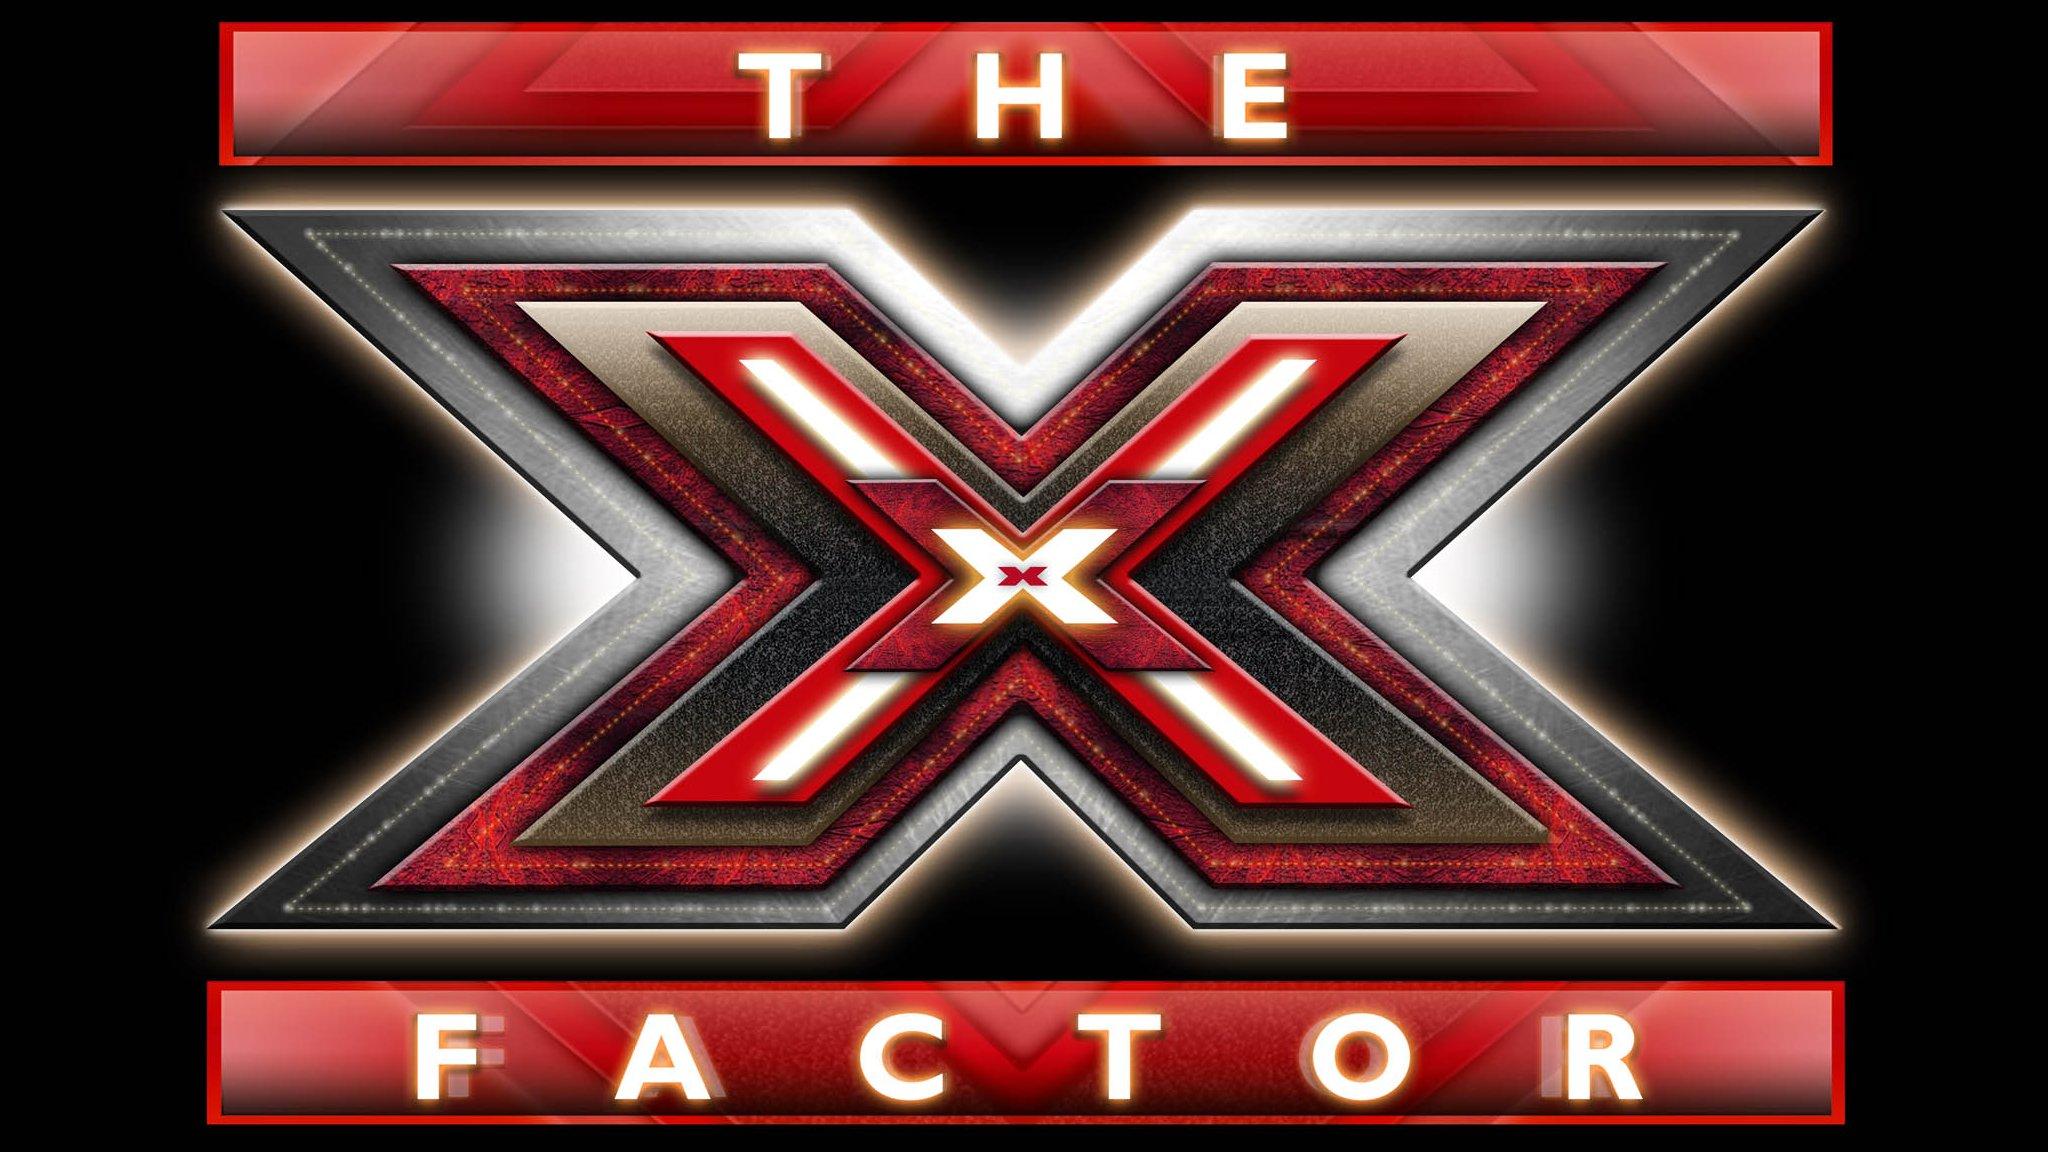 X factor - TV talent show